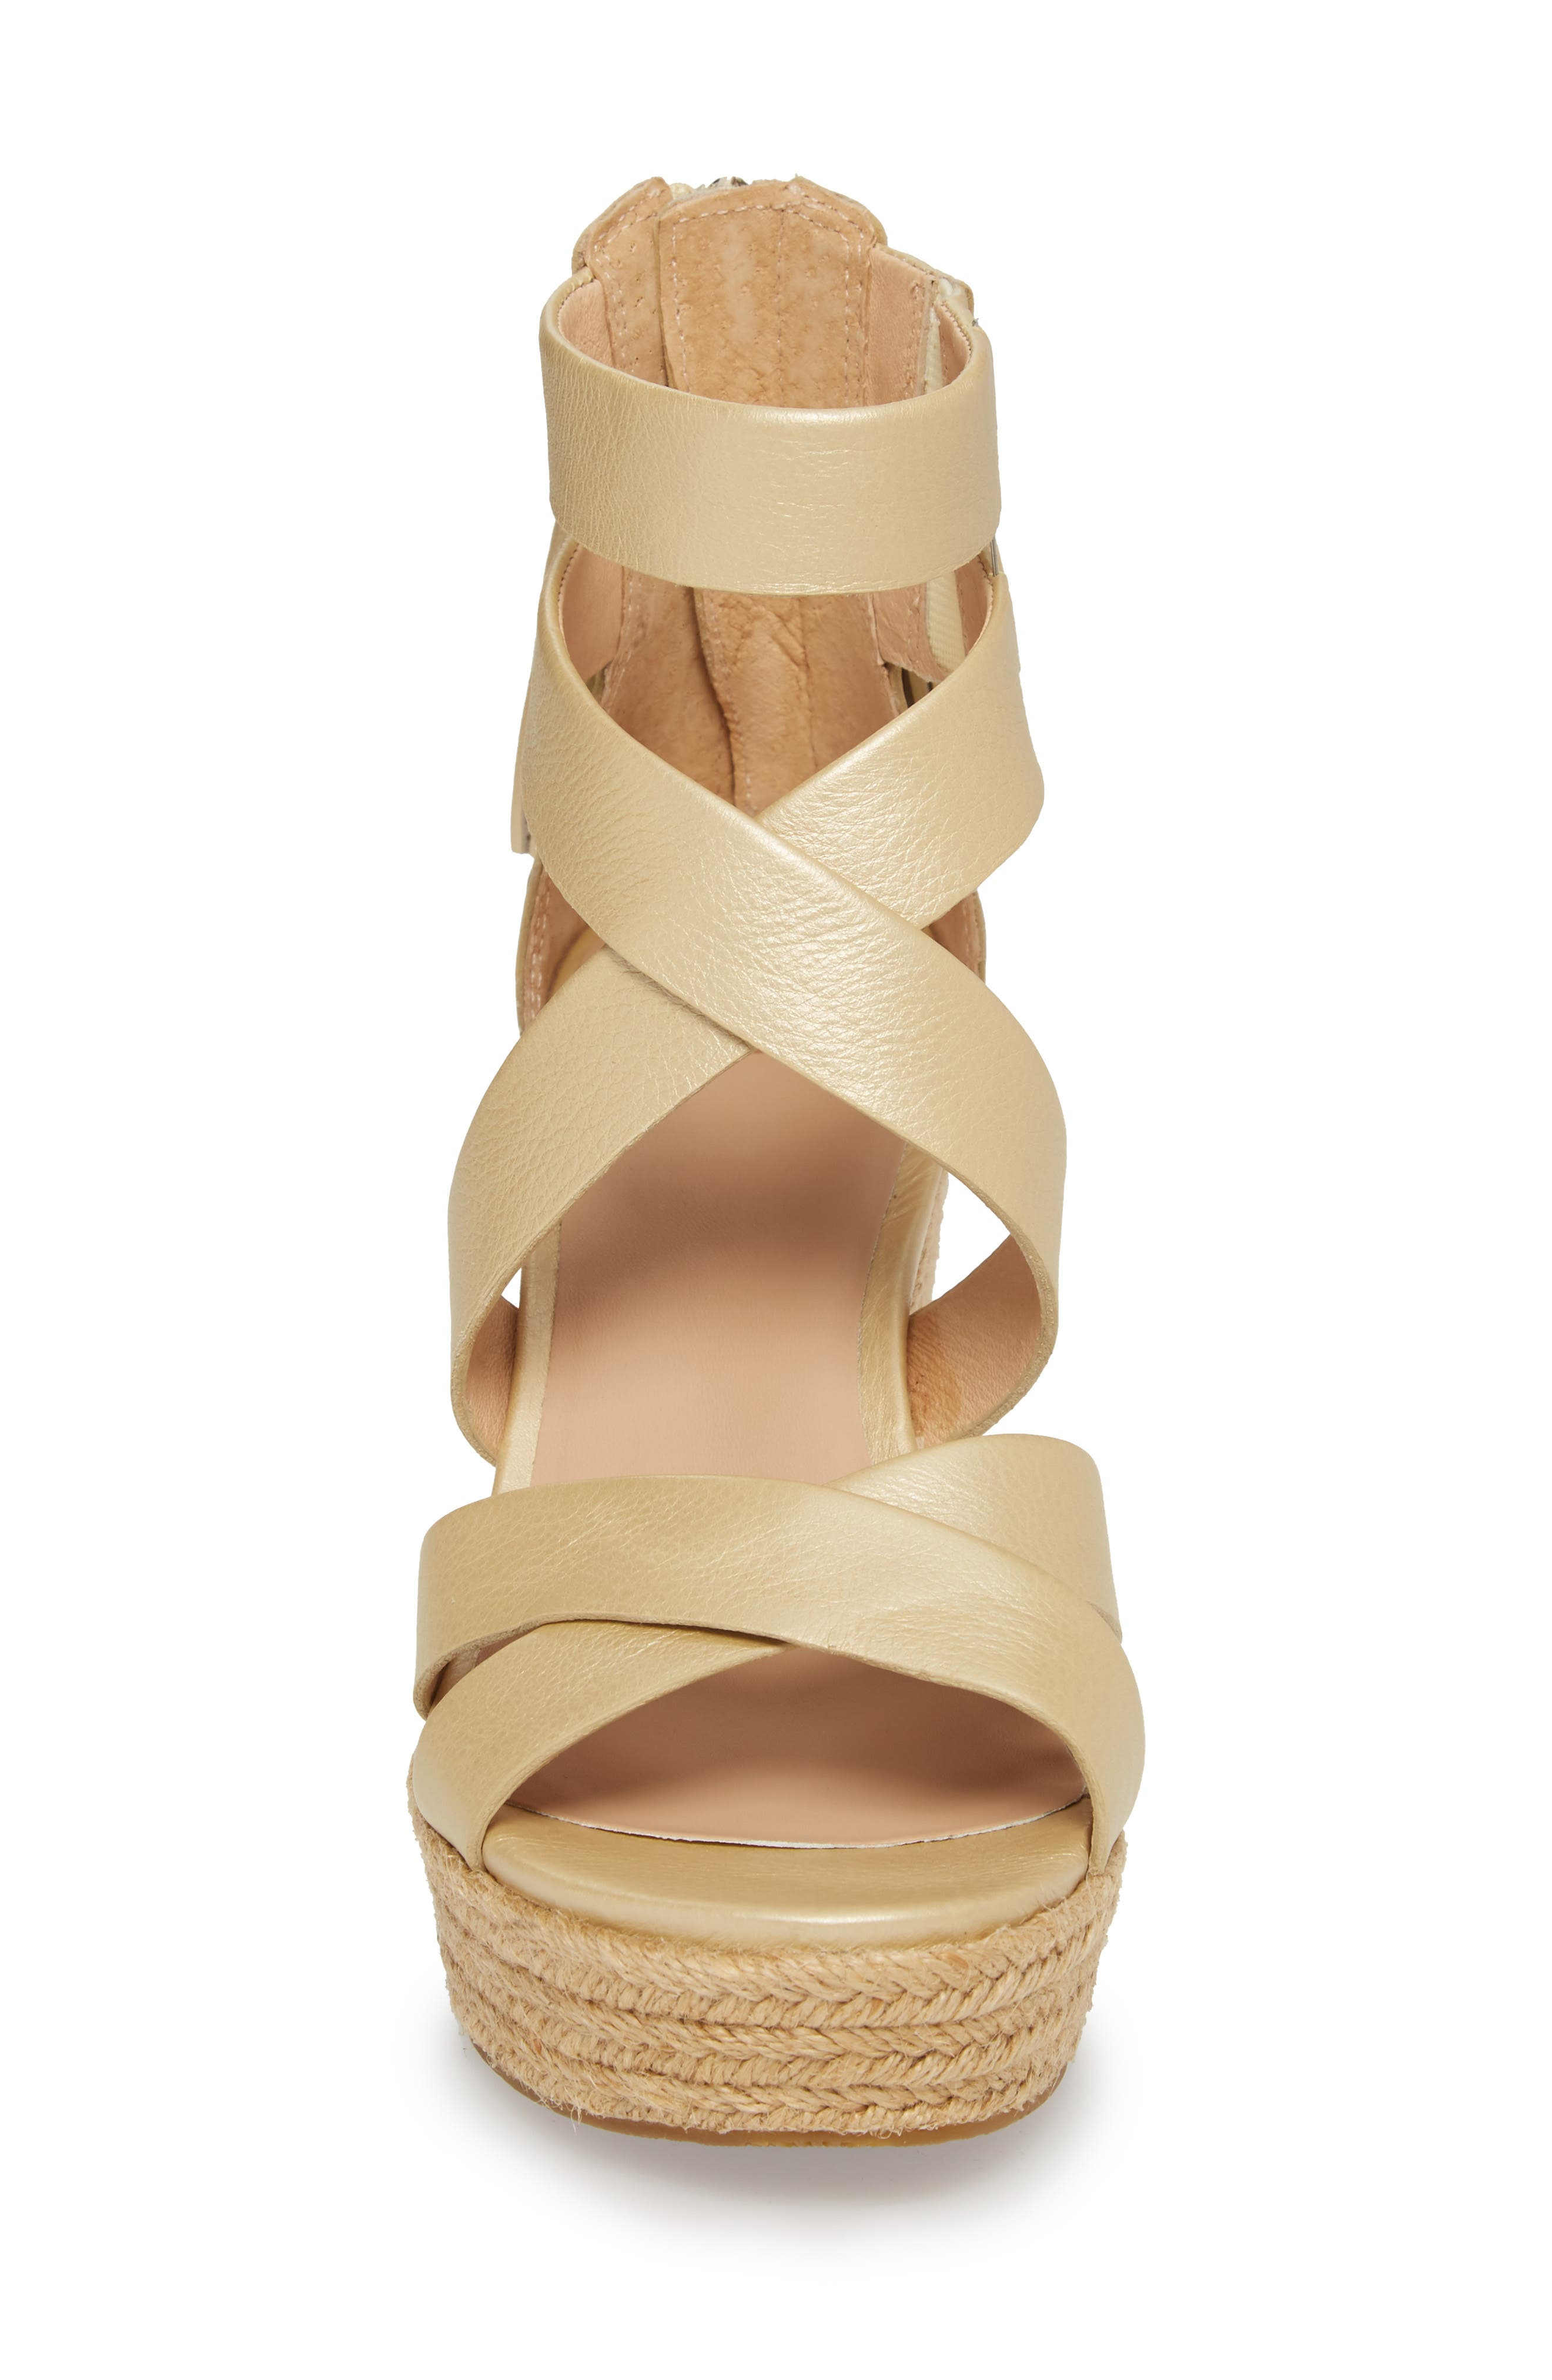 Raquel Platform Wedge Sandal,                             Alternate thumbnail 4, color,                             Soft Gold Leather